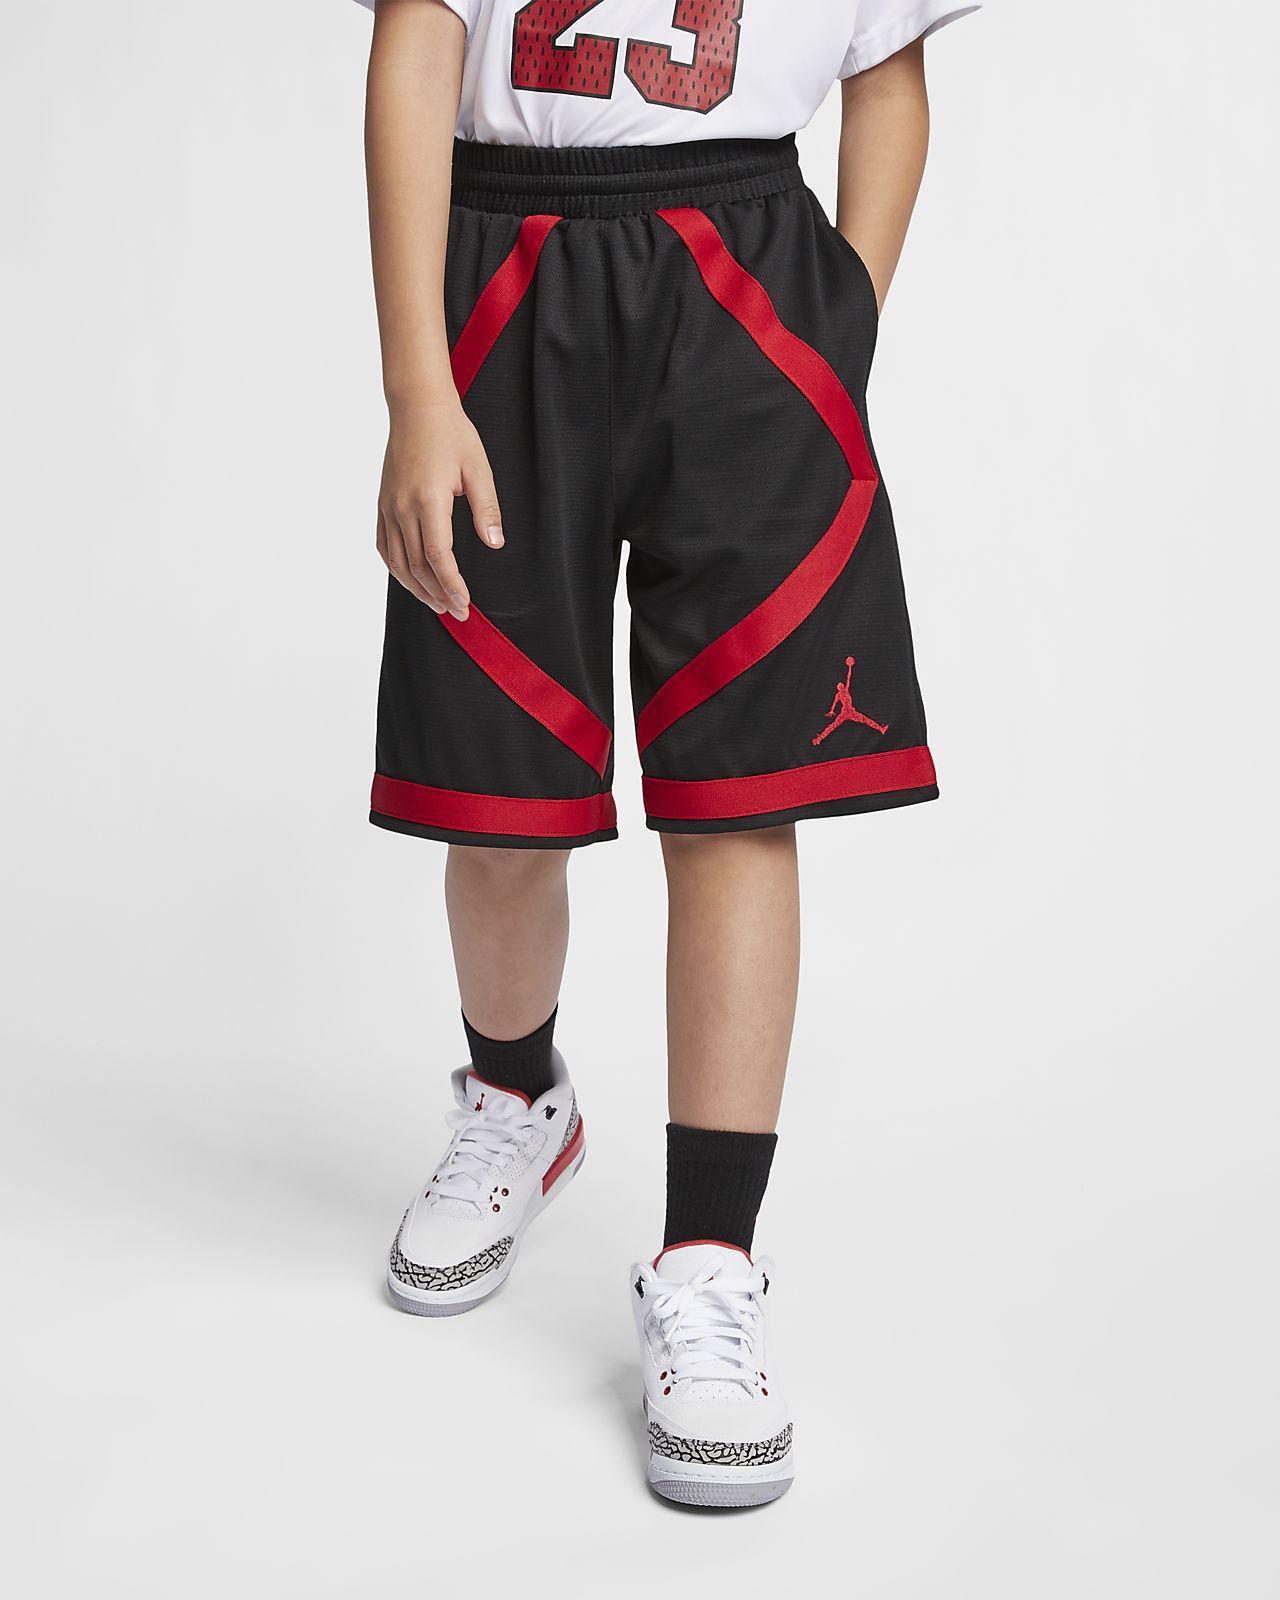 Jordan Dri-FIT Diamond Big Kids' (Boys') Shorts